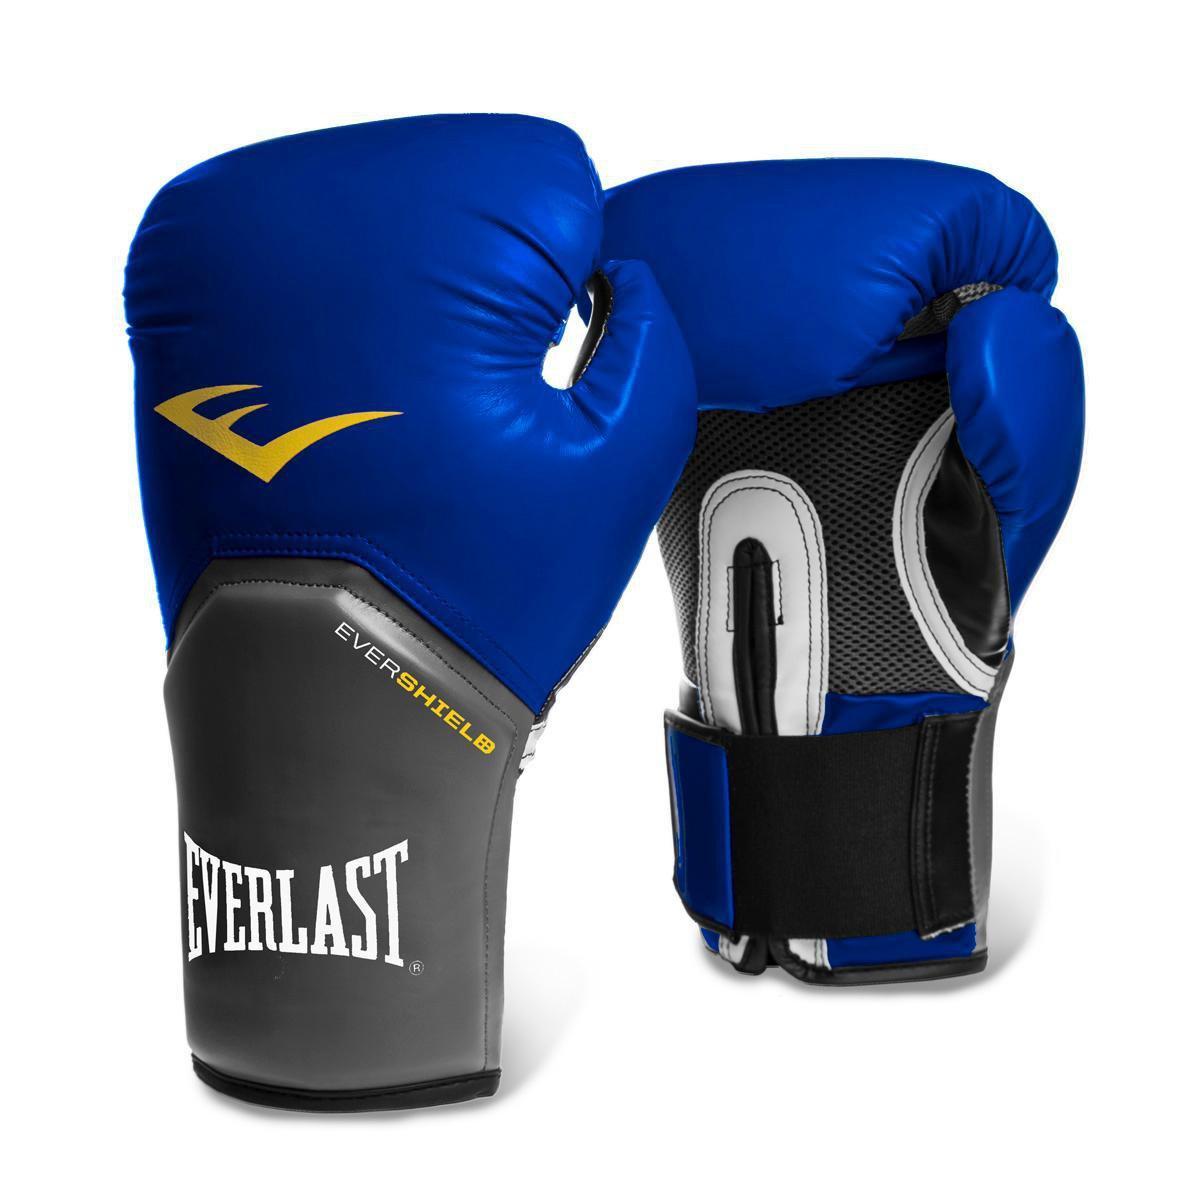 0249dc0c996b5 Luva de Boxe Muay Thai Everlast Pro Style - 12 oz - Azul - Compre Agora